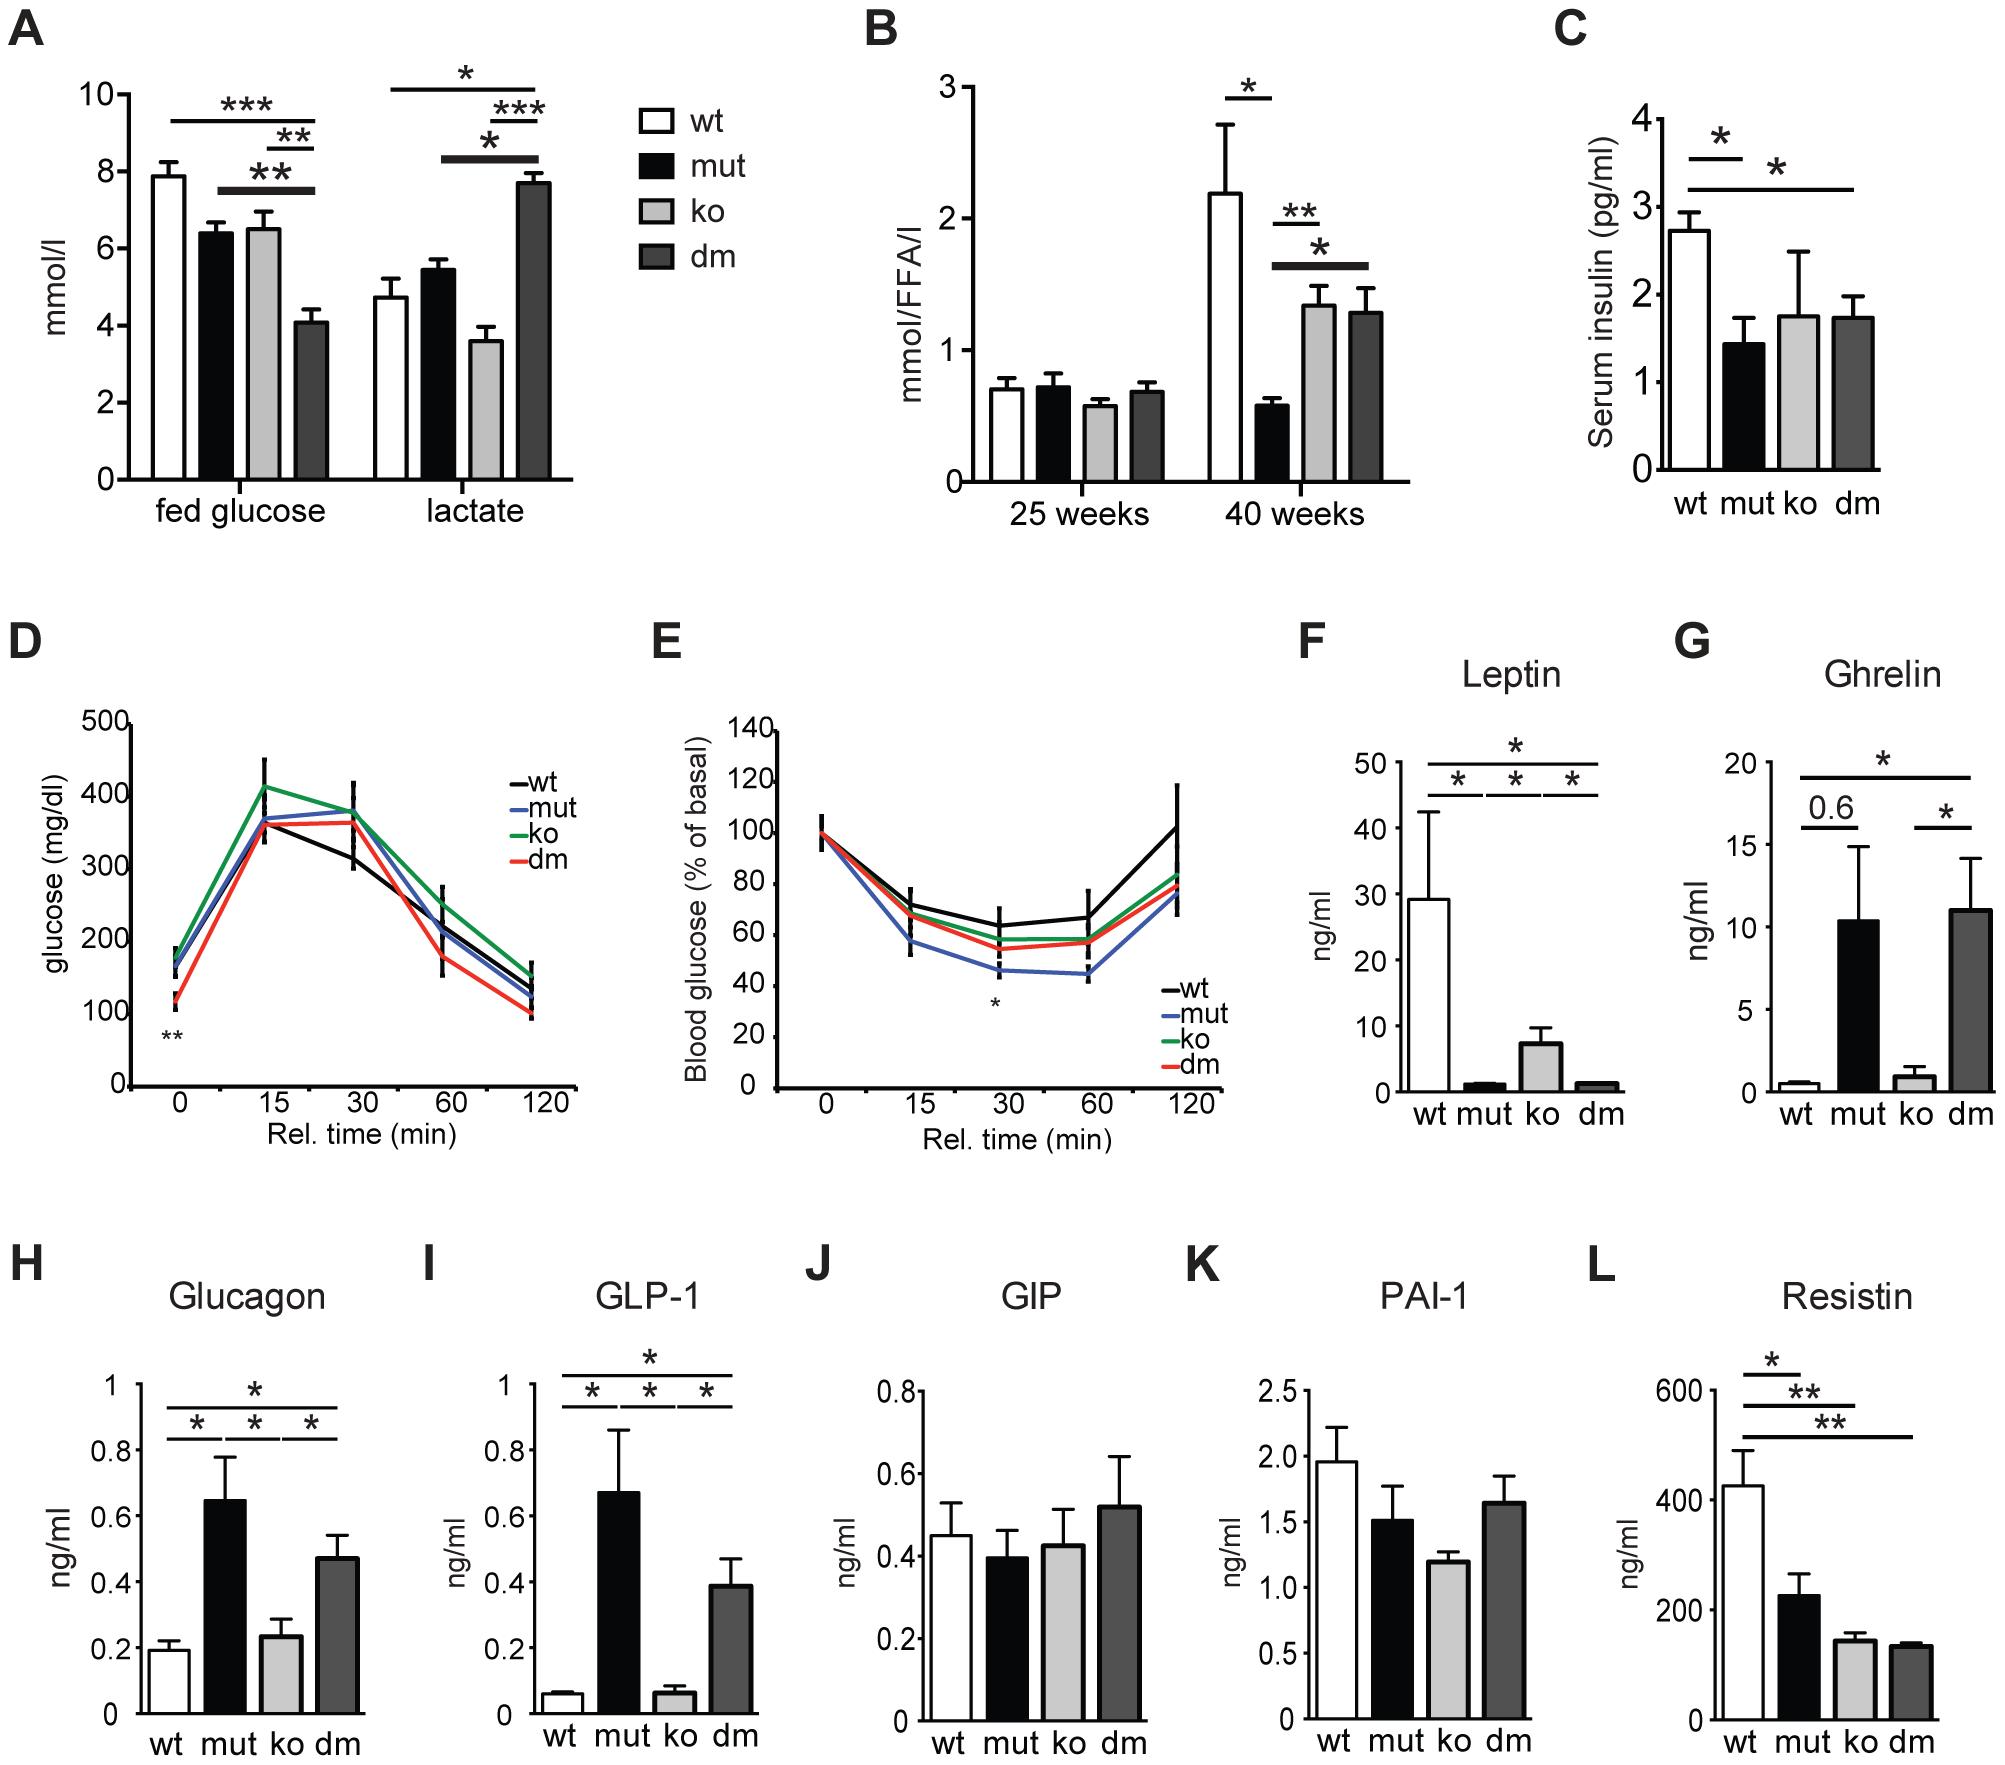 Characterization of blood metabolites in wild type (wt), mtDNA mutator (mut), UCP2-deficient wild type (ko) and mtDNA mutator (dm) mice.